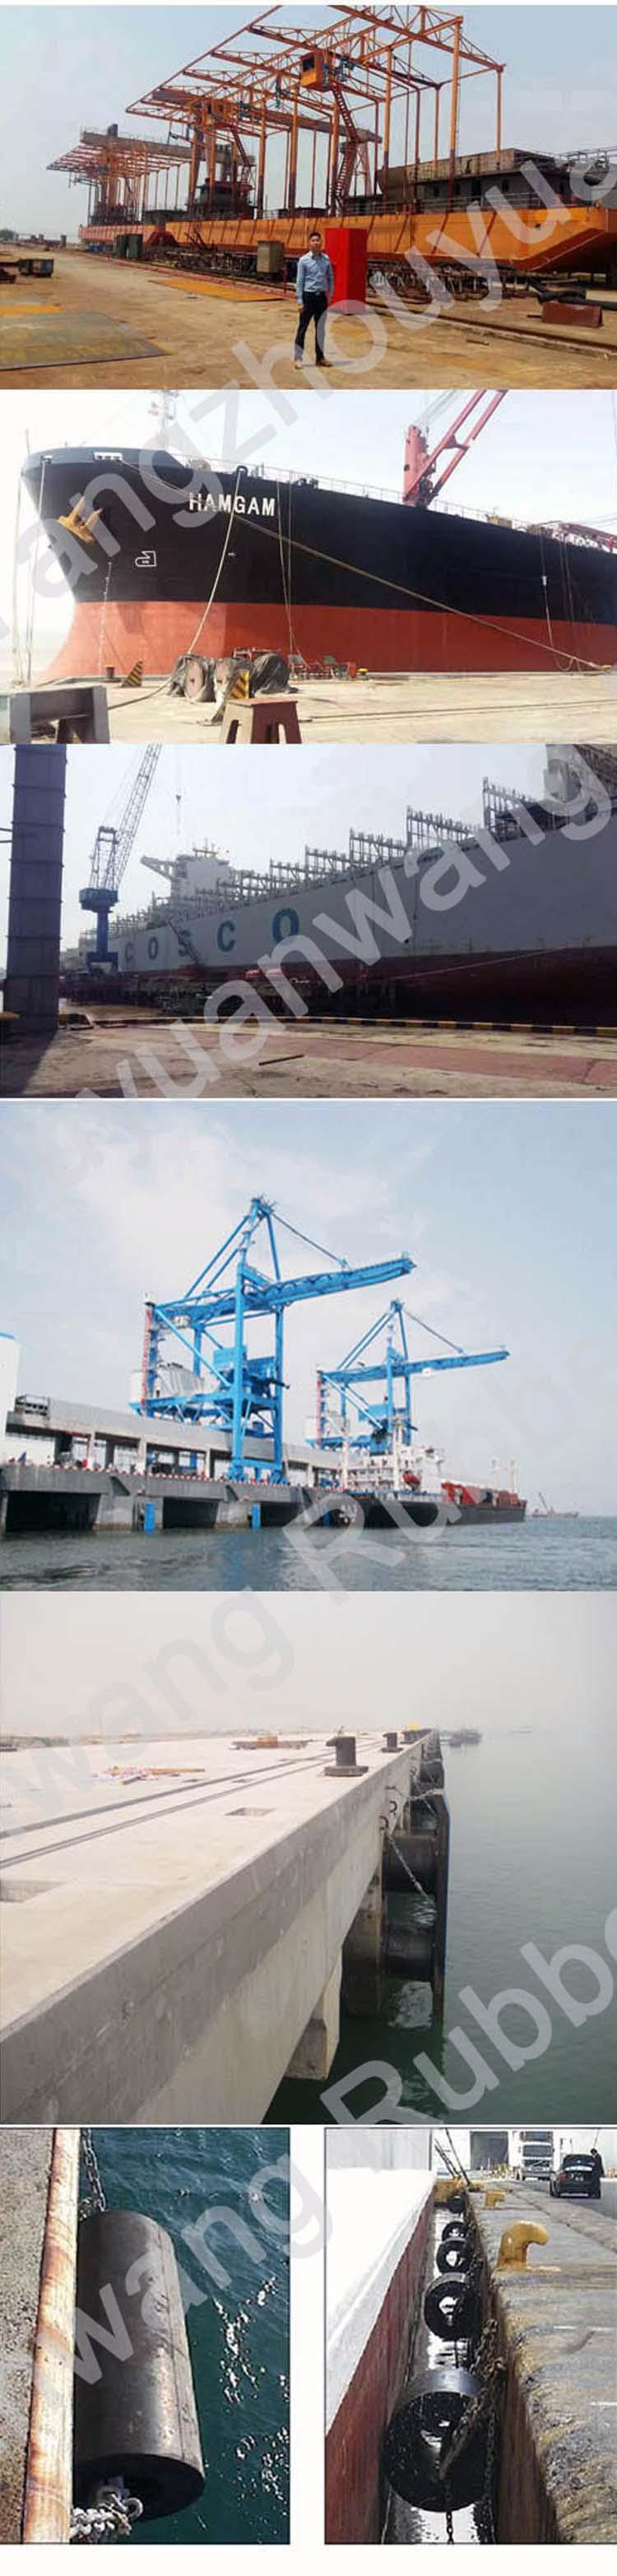 Marine Ship Boat Solid Dock Semi-Cylindrical Rubberfender